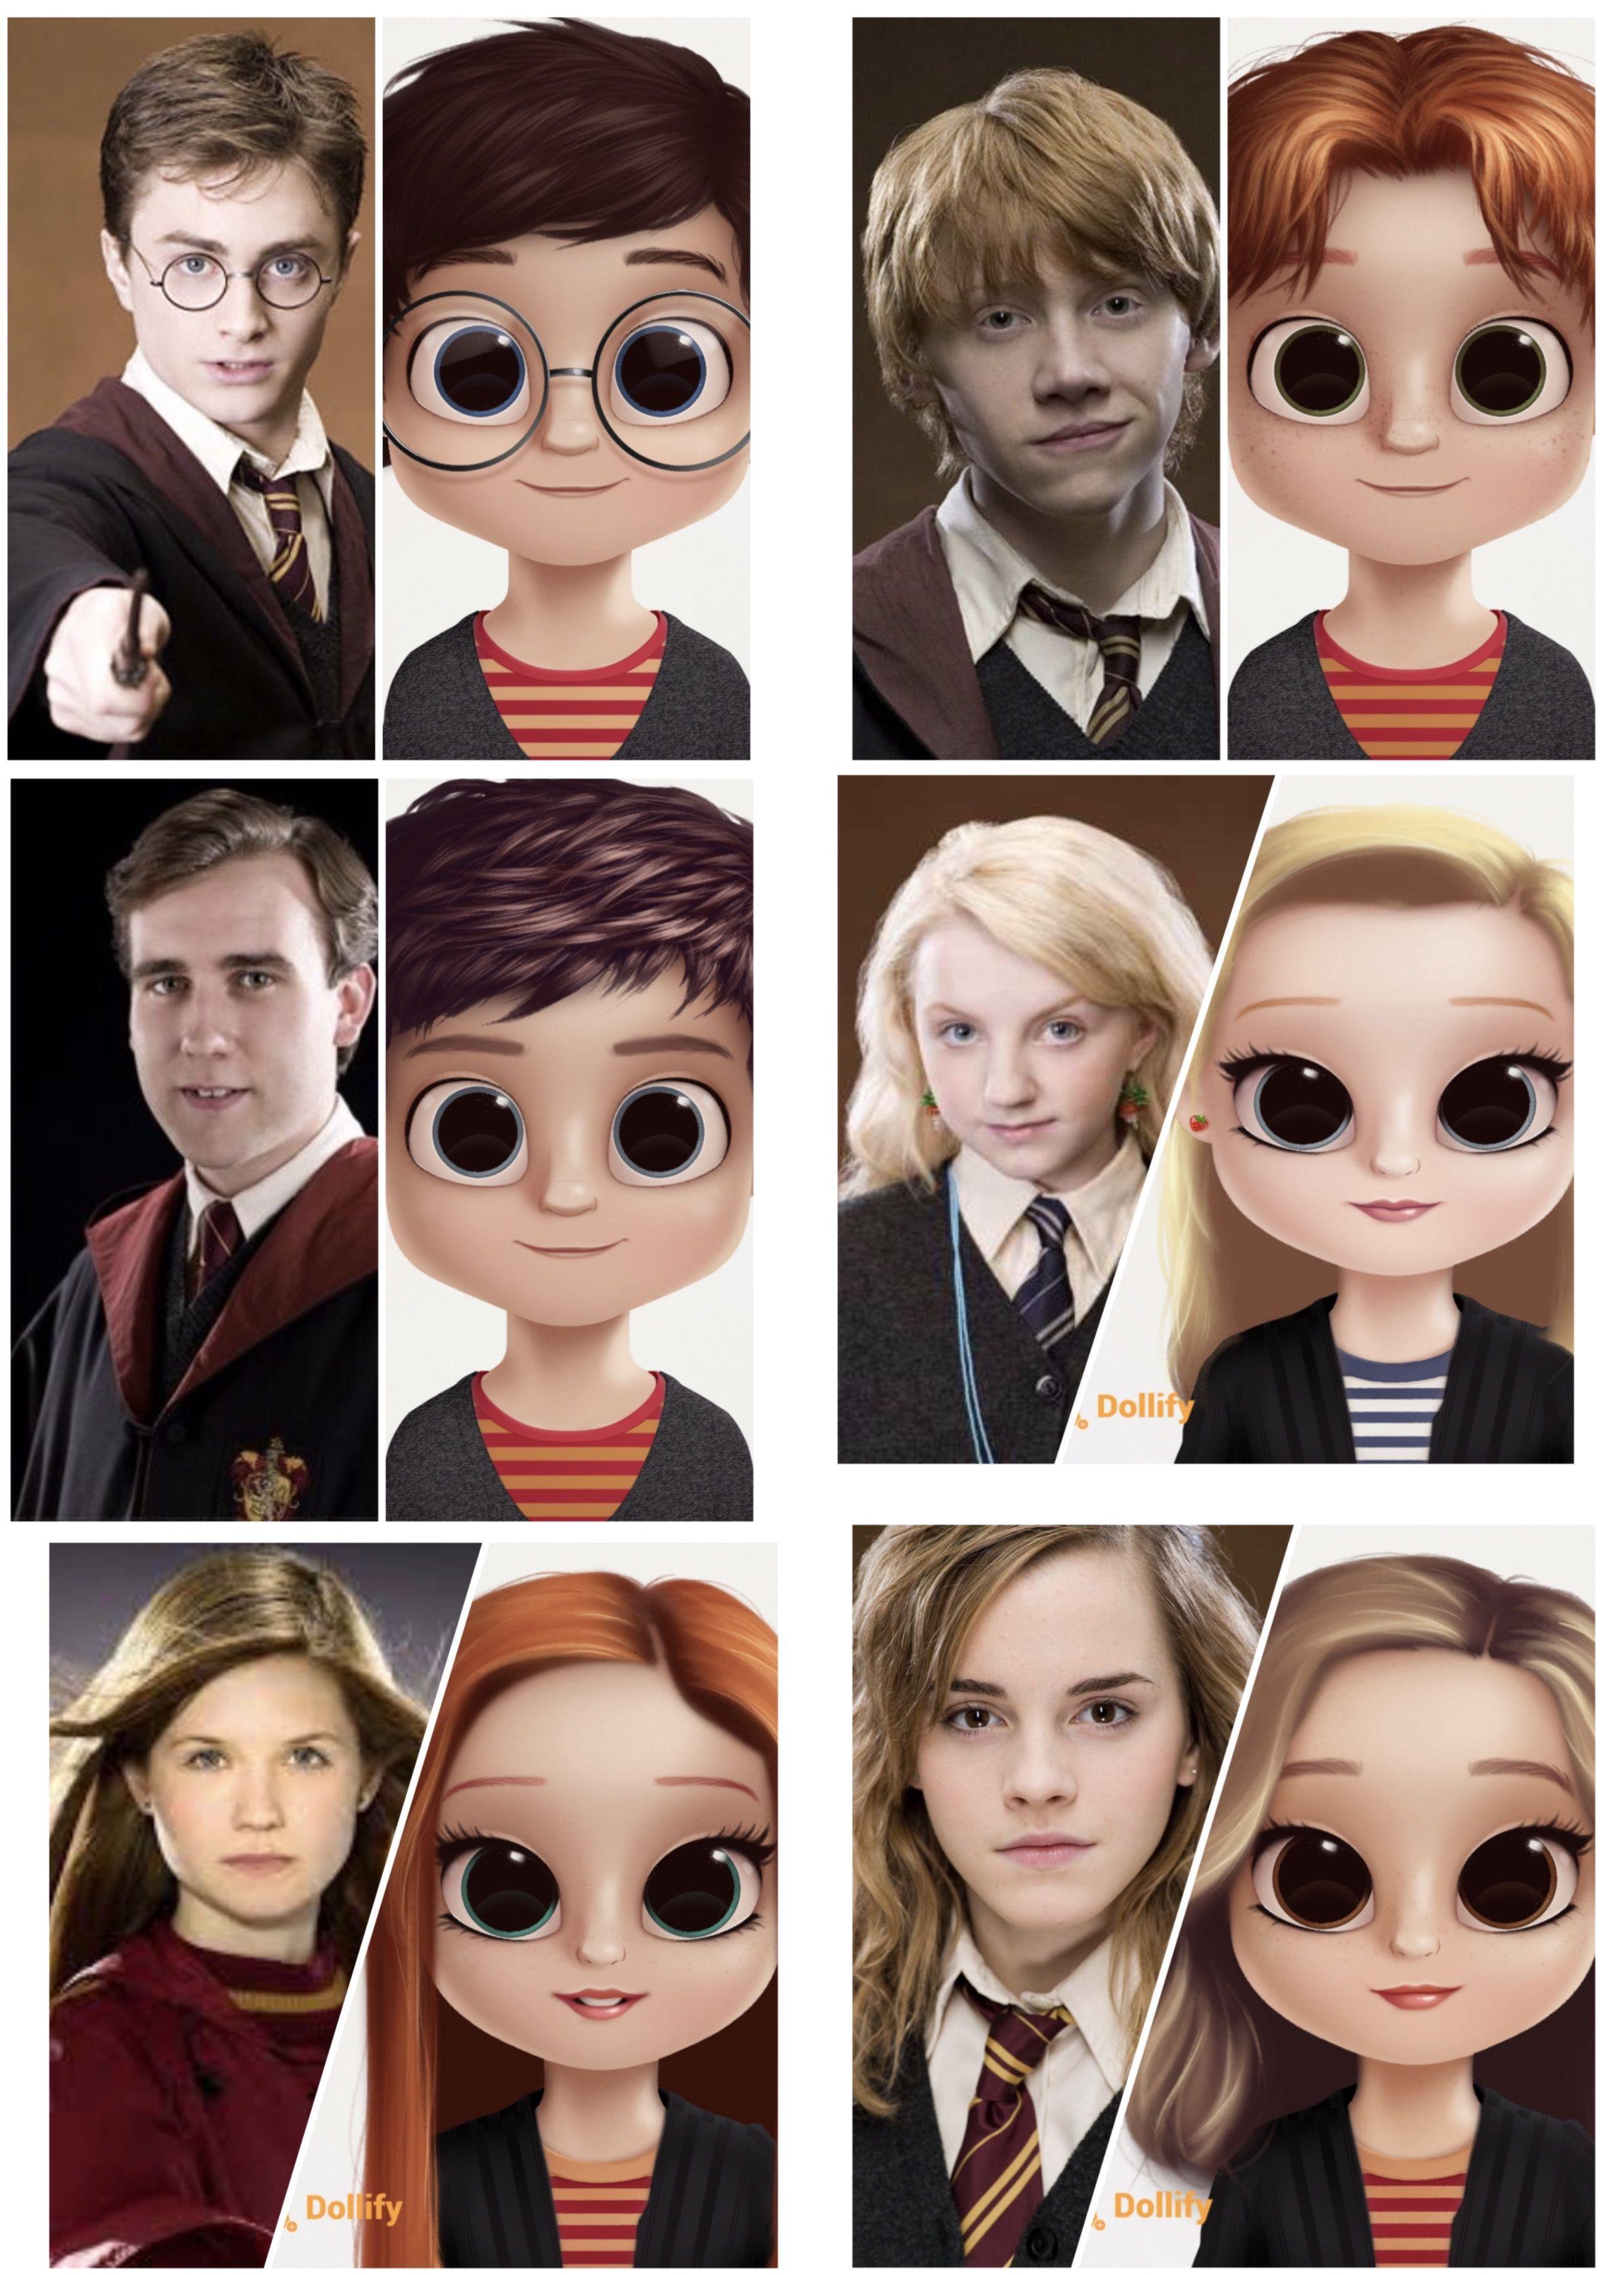 Harry Potter Dollify Harry Potter Art Cute Girl Wallpaper Cute Disney Wallpaper